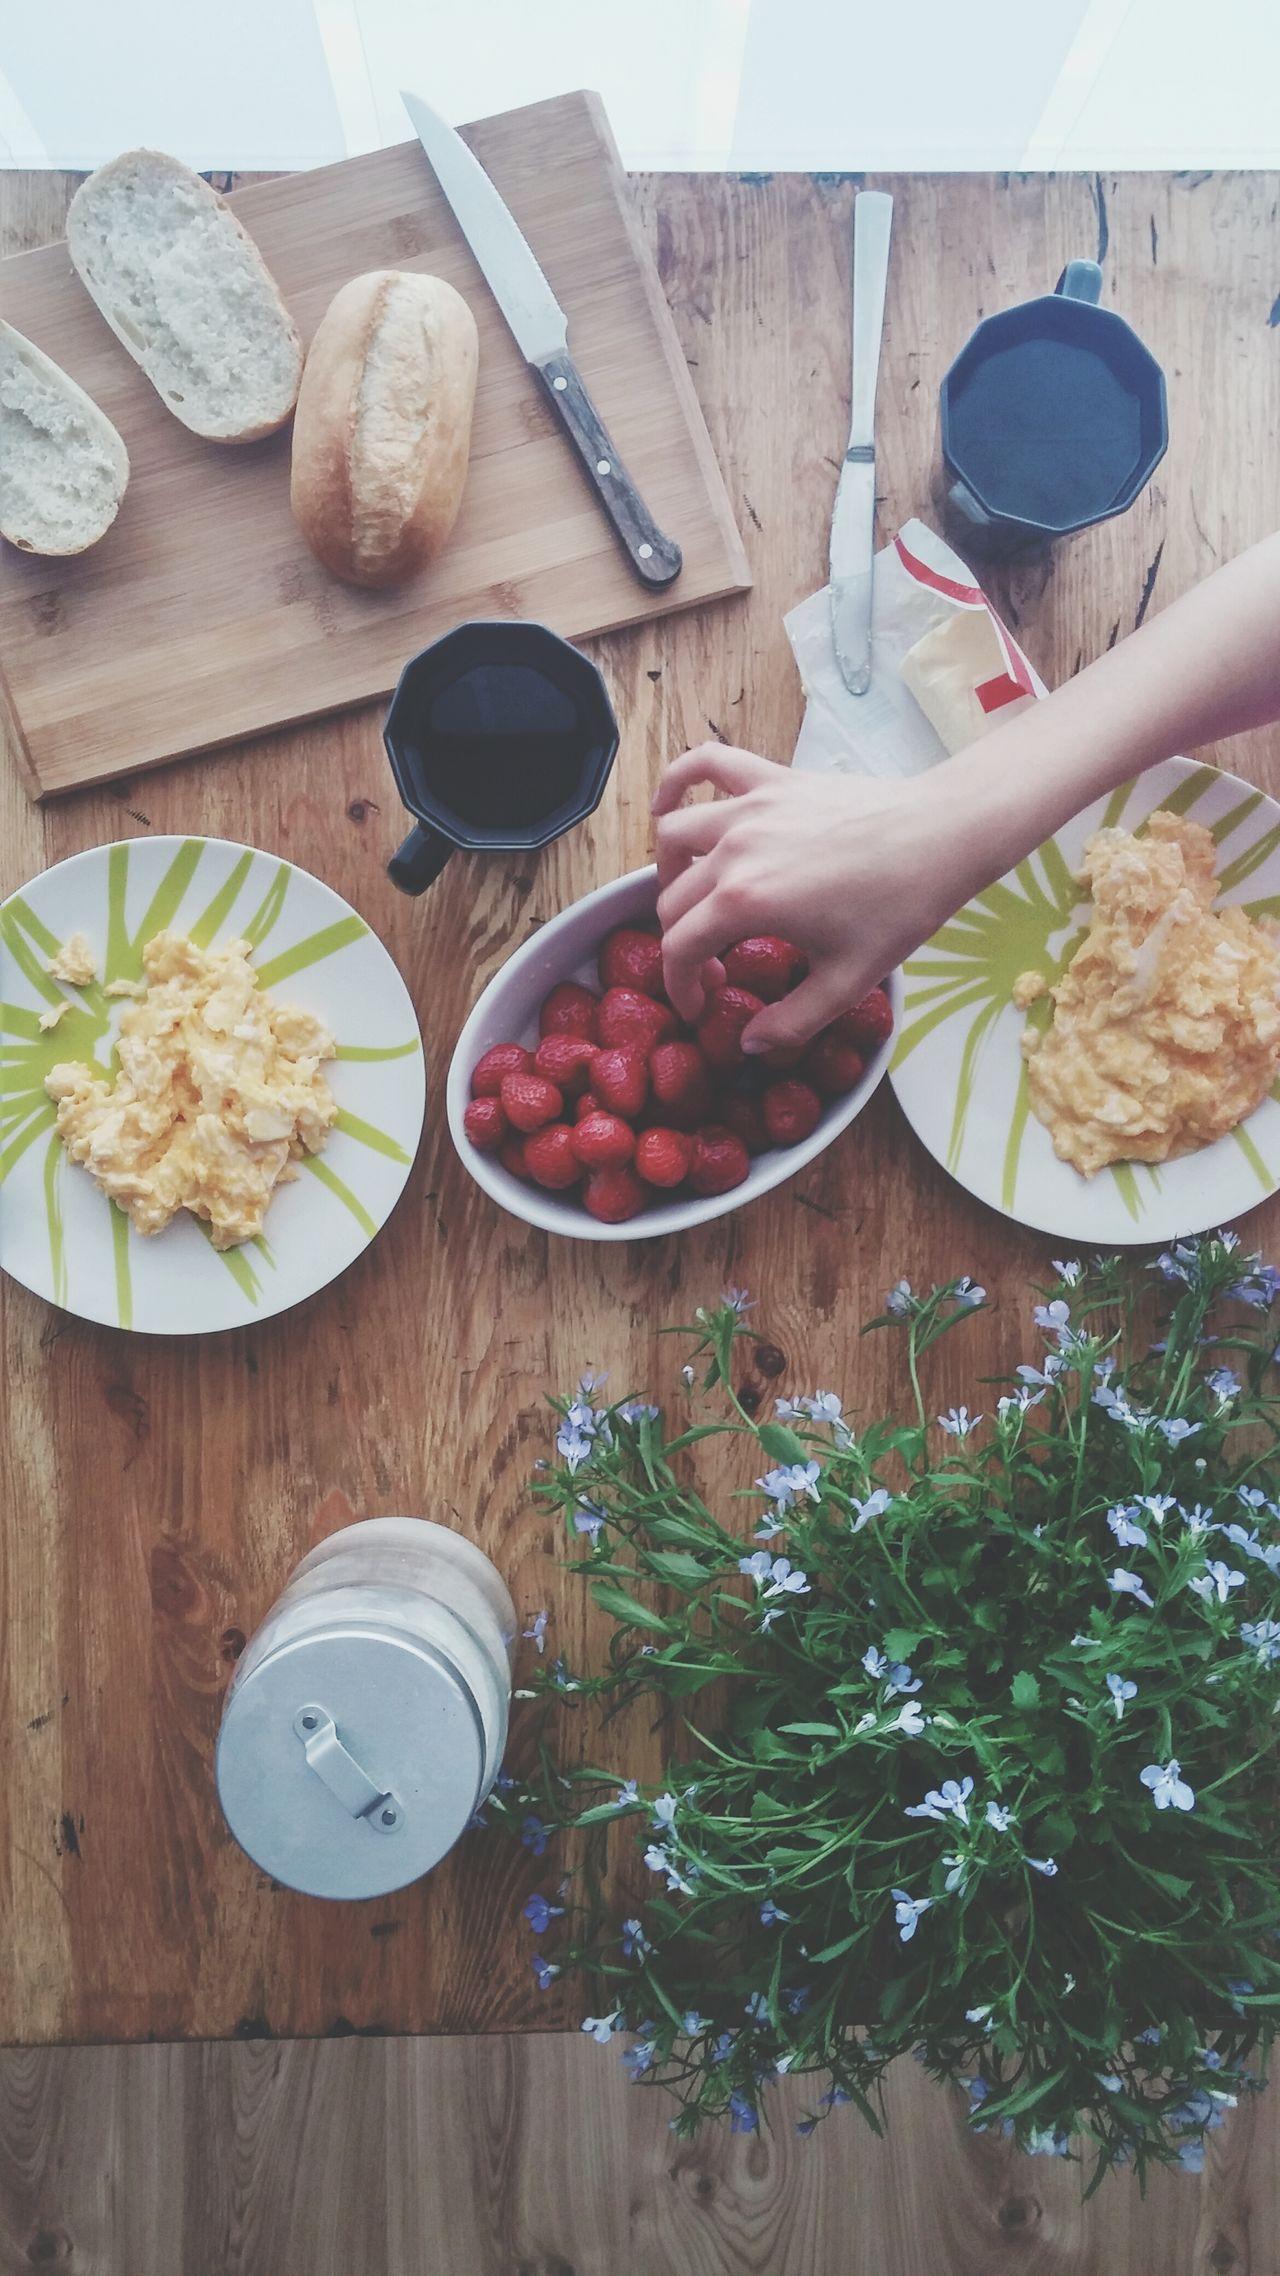 EyeEm Best Shots Breakfast Plant Summer The Essence Of Summer